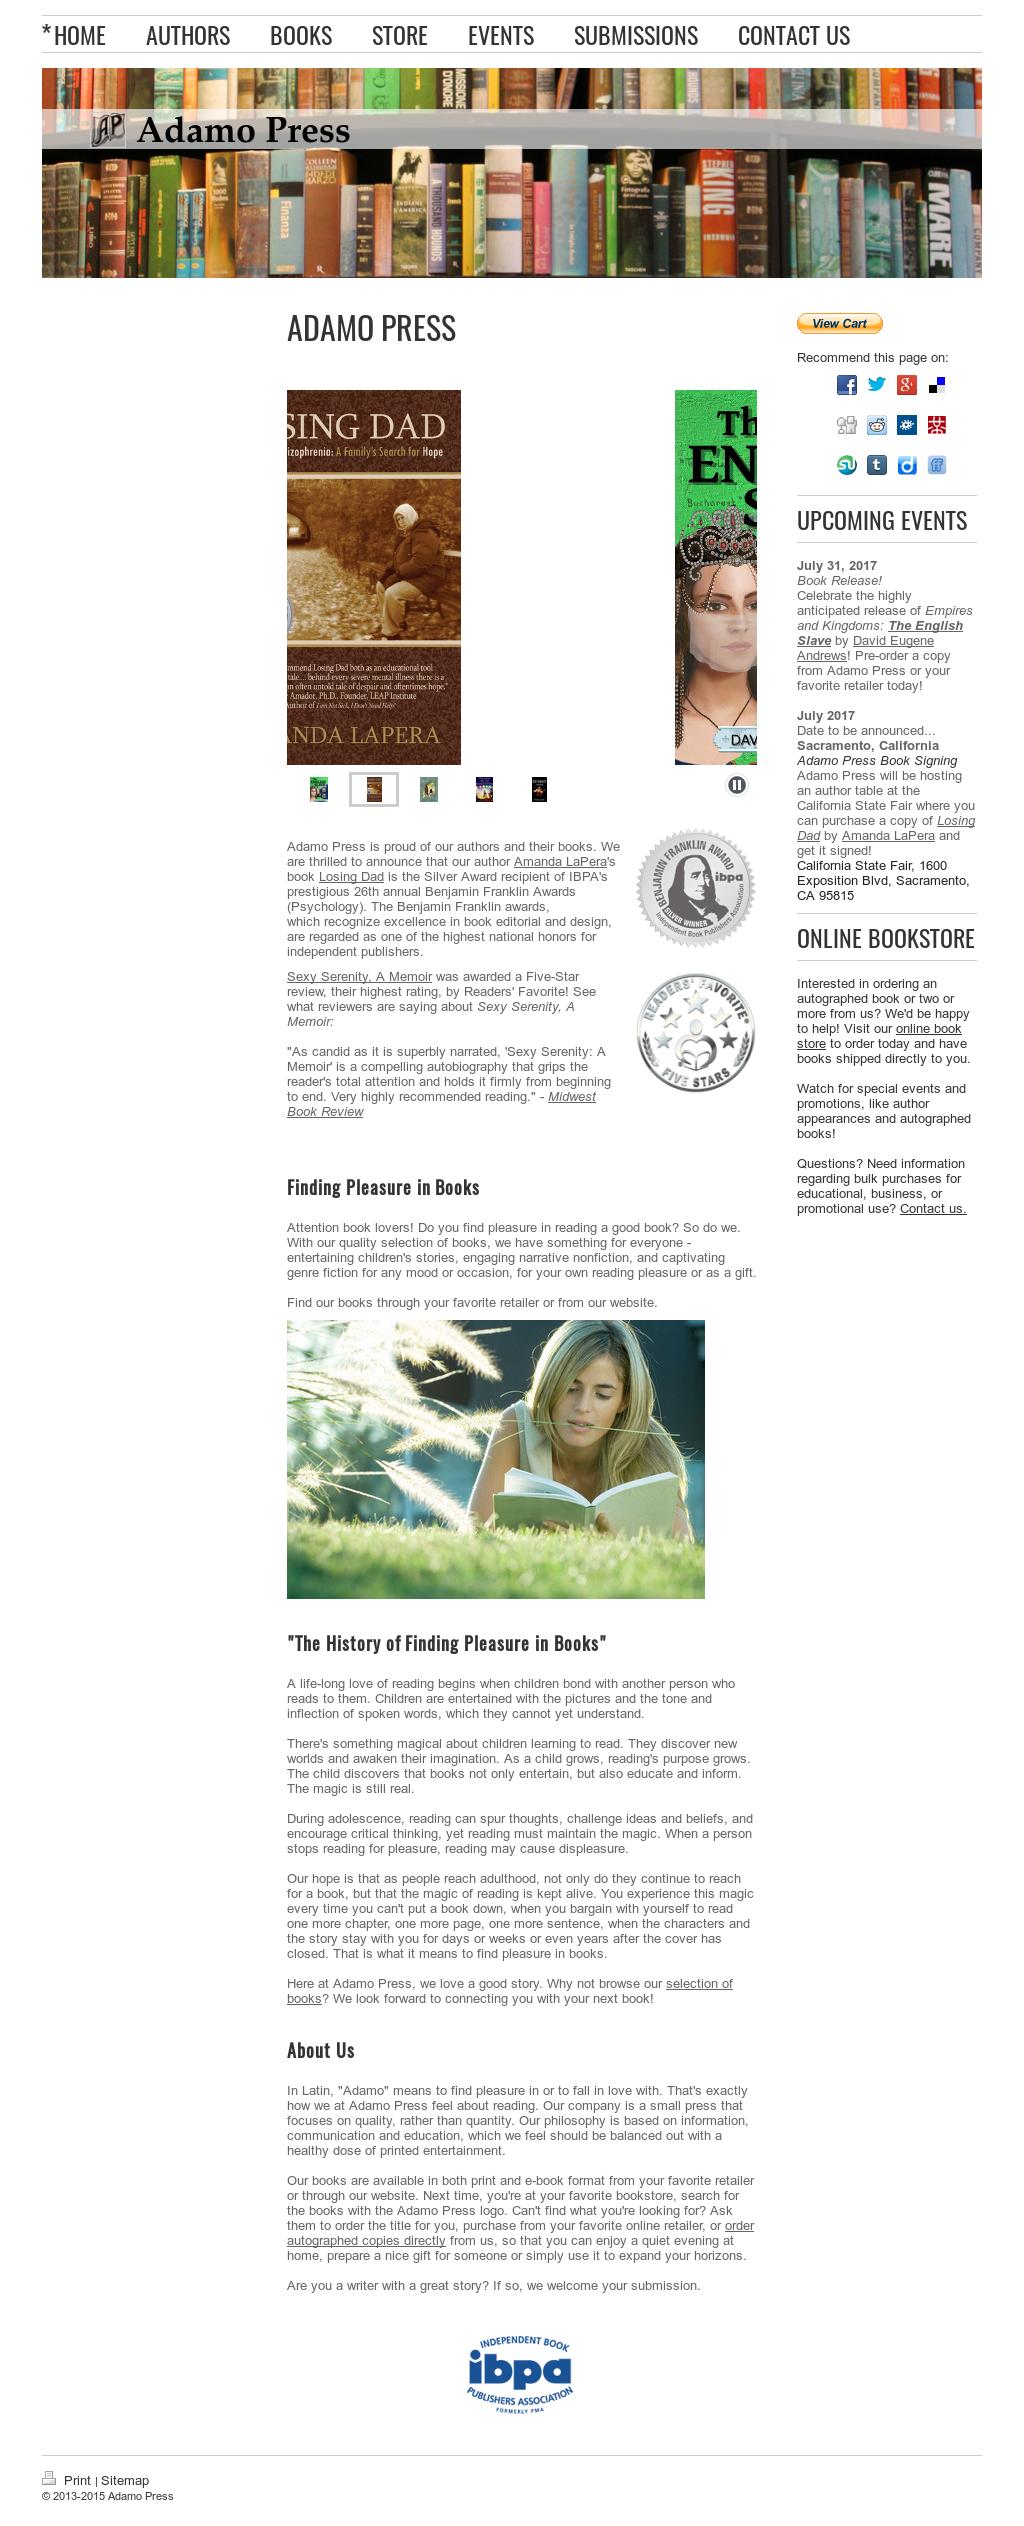 Adamo Press Competitors, Revenue and Employees - Owler